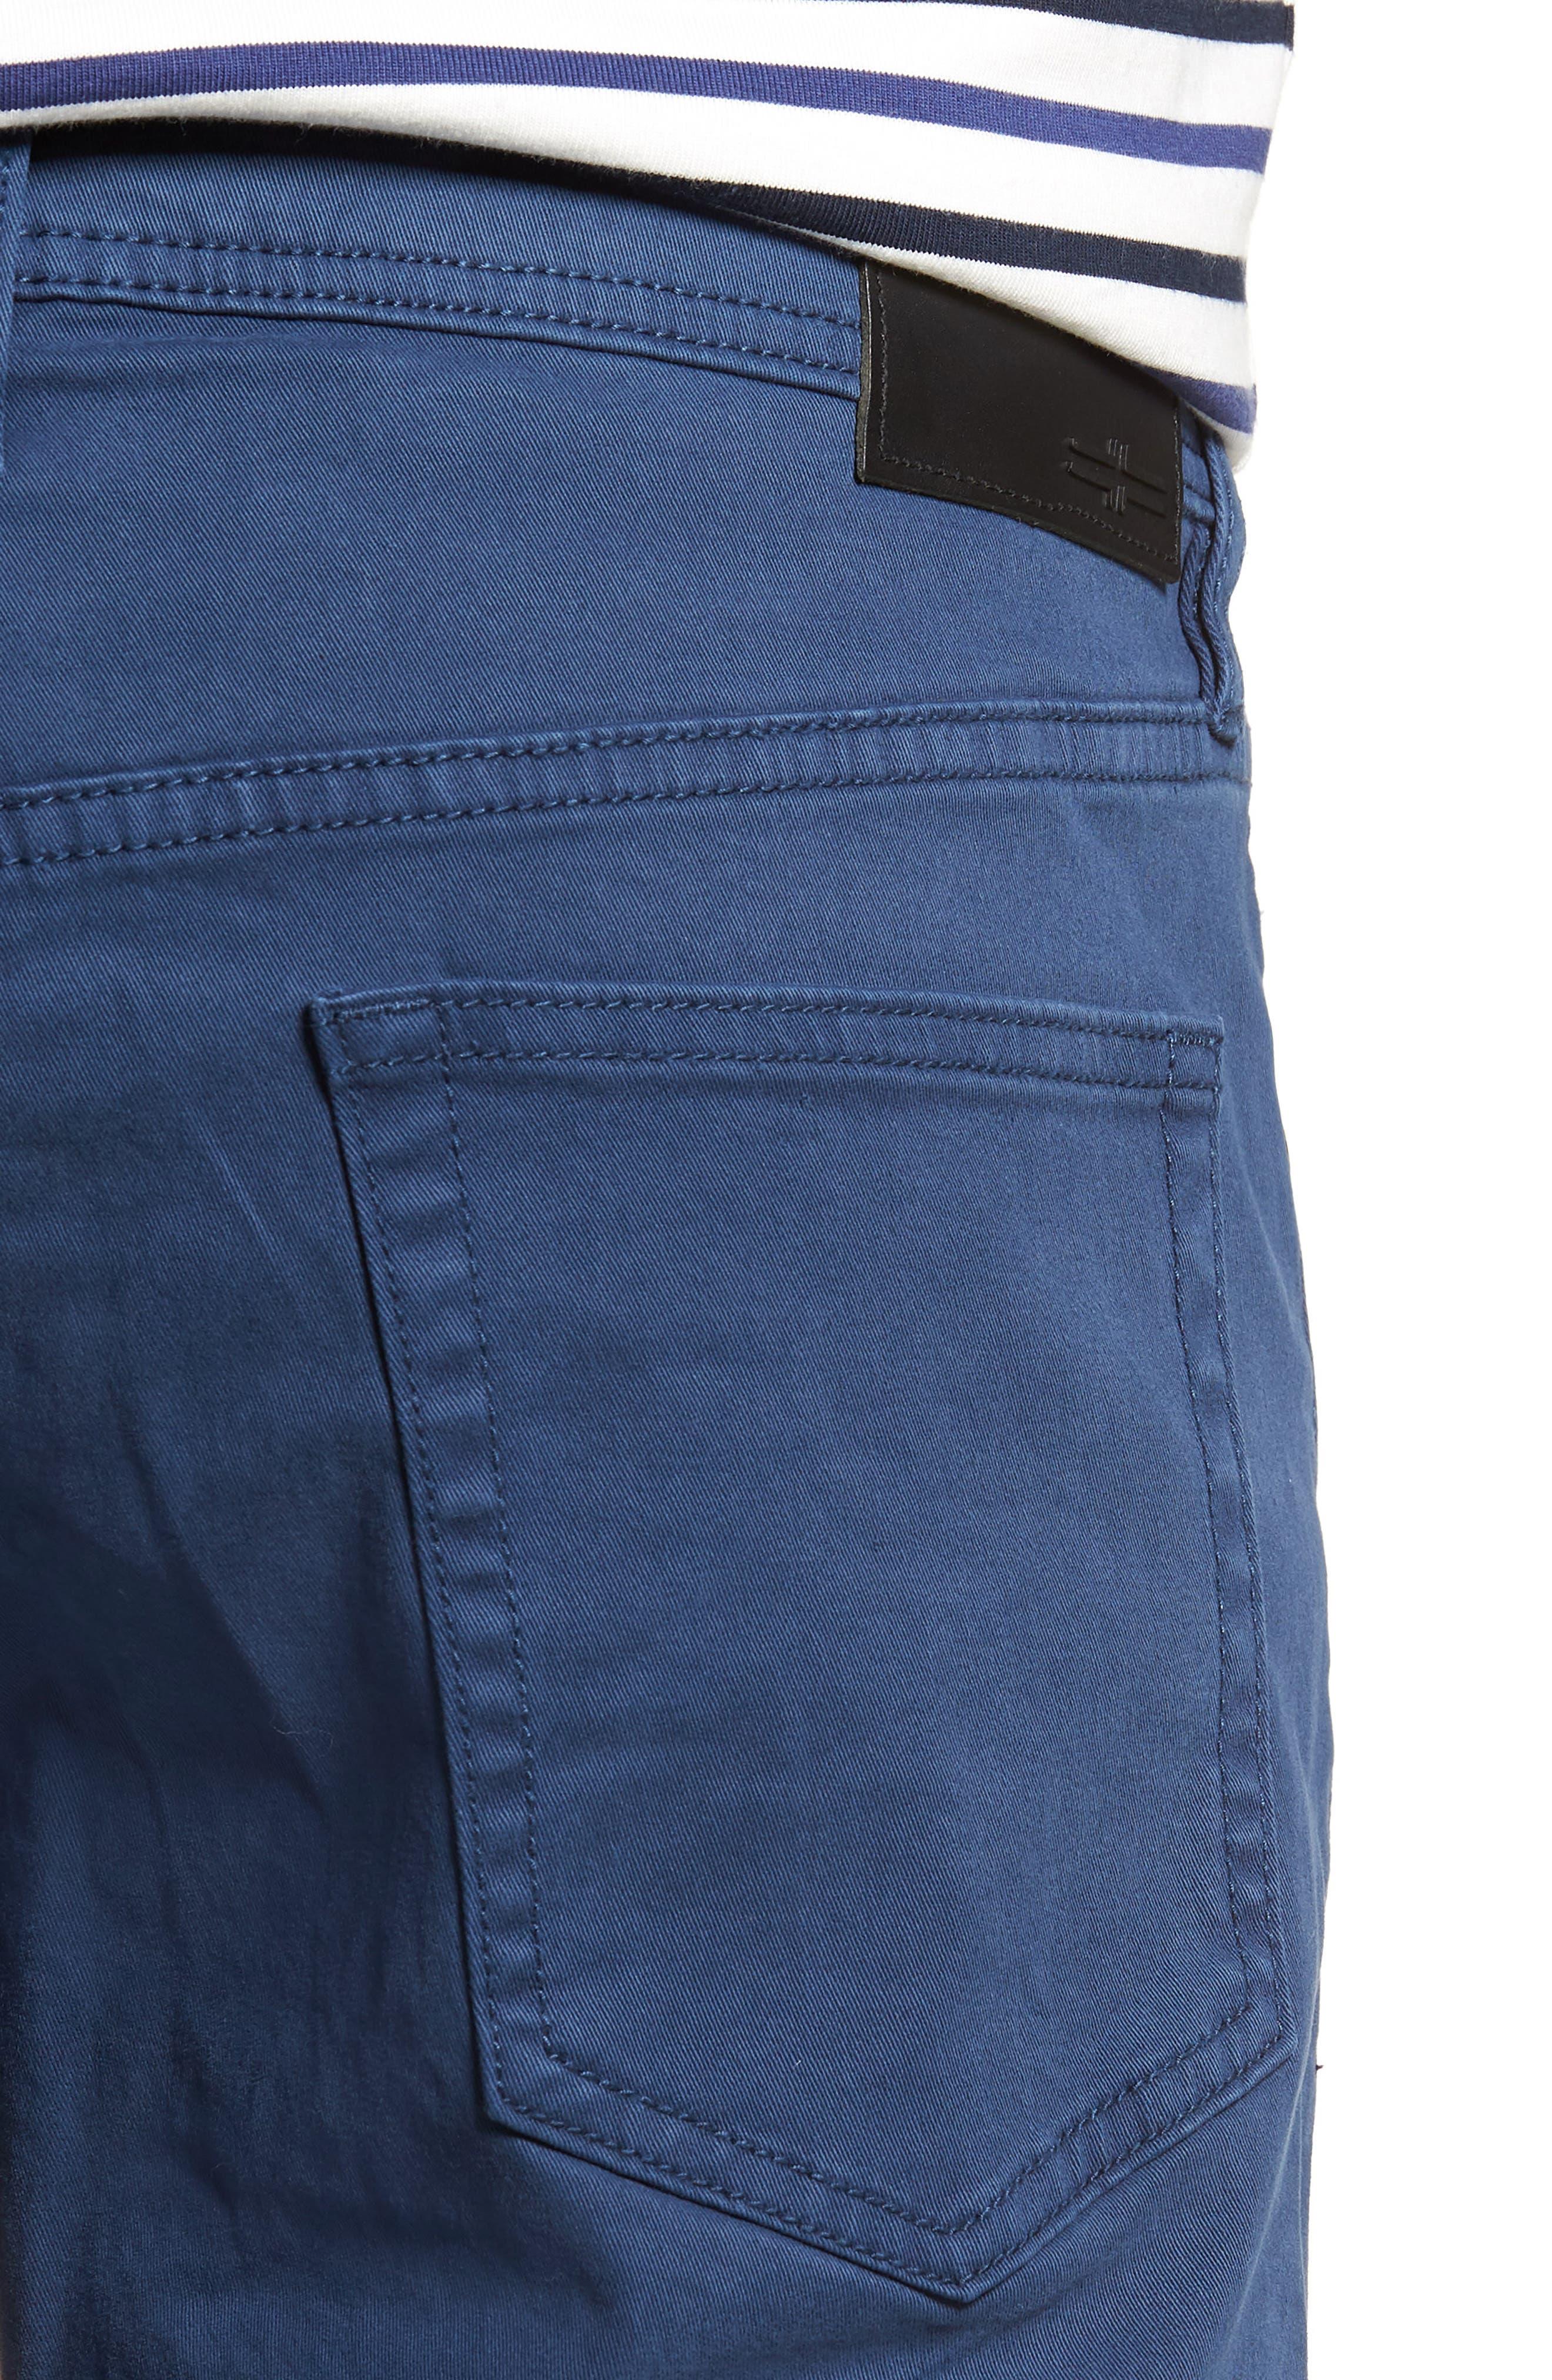 Alternate Image 4  - Liverpool Jeans Co. Kingston Slim Straight Leg Jeans (Blue Twilight)